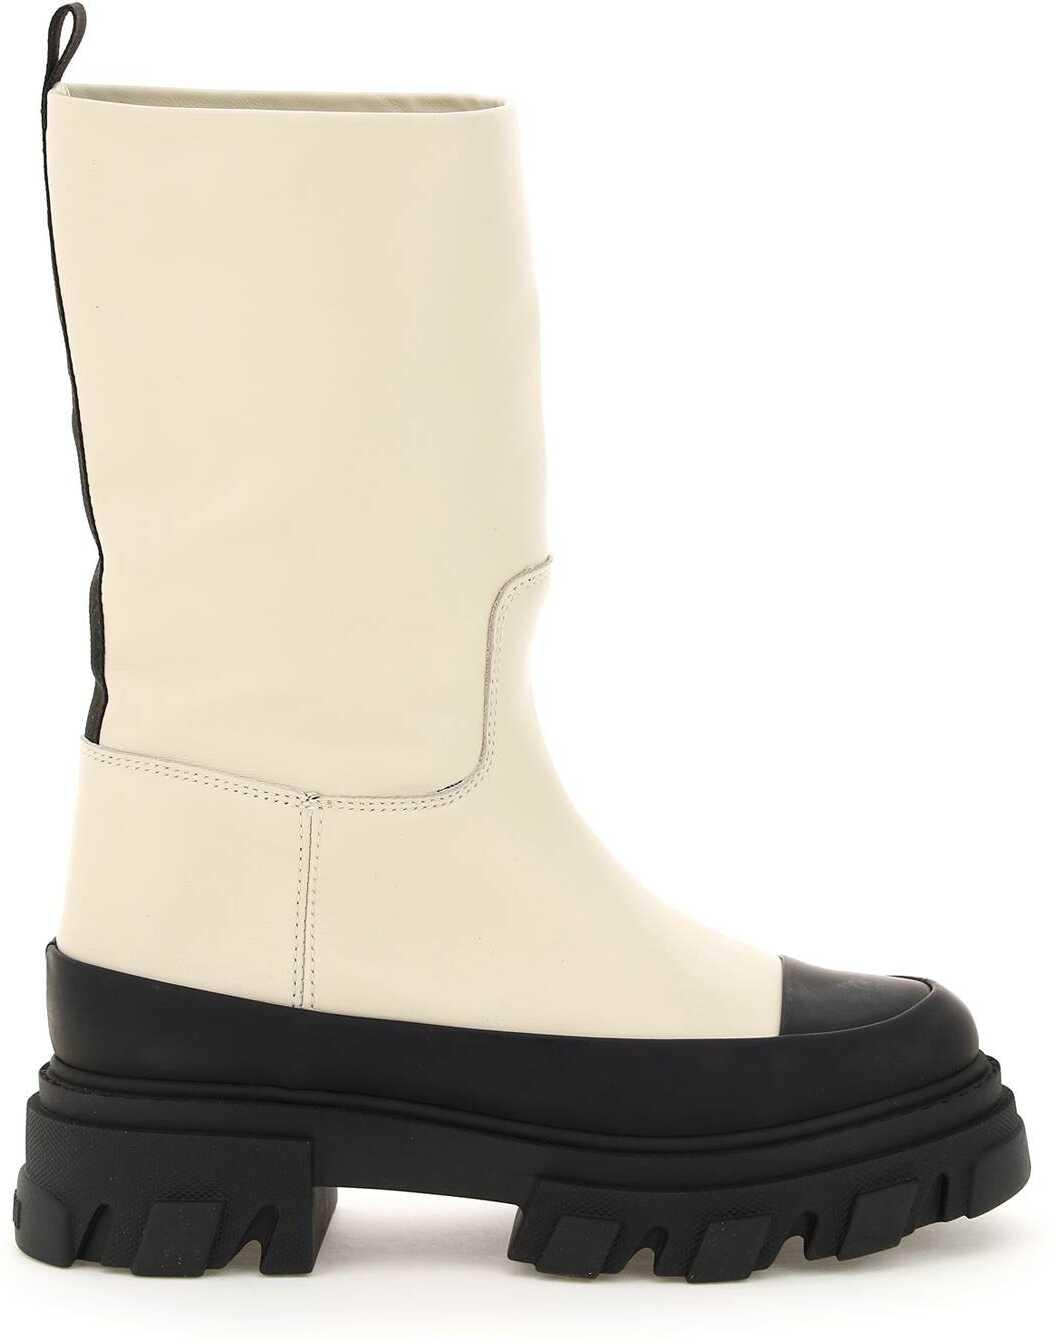 Ganni Tubular Leather Boots S1575 OYSTER GREY image0